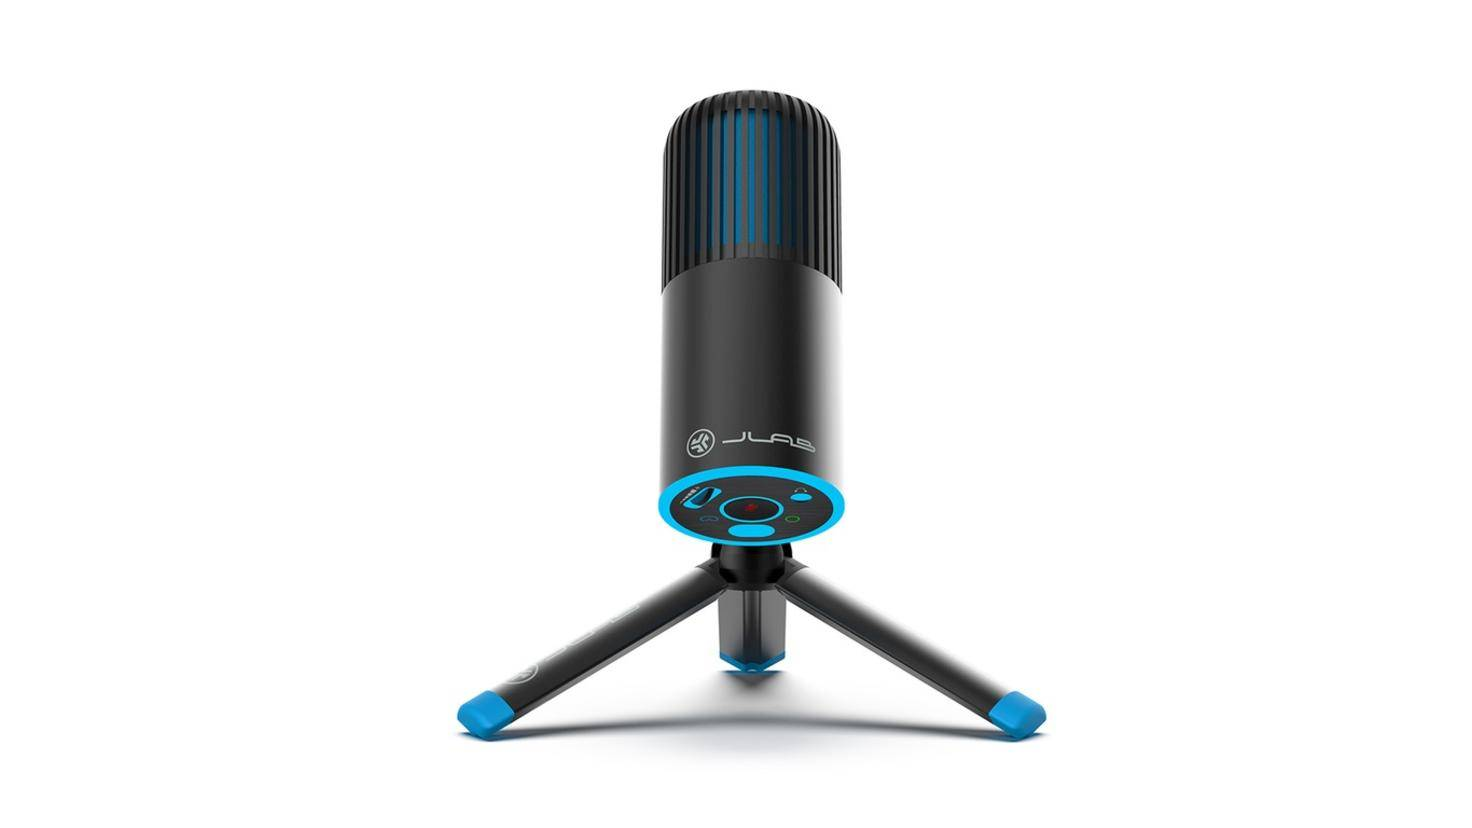 JLab Talk Go microphone